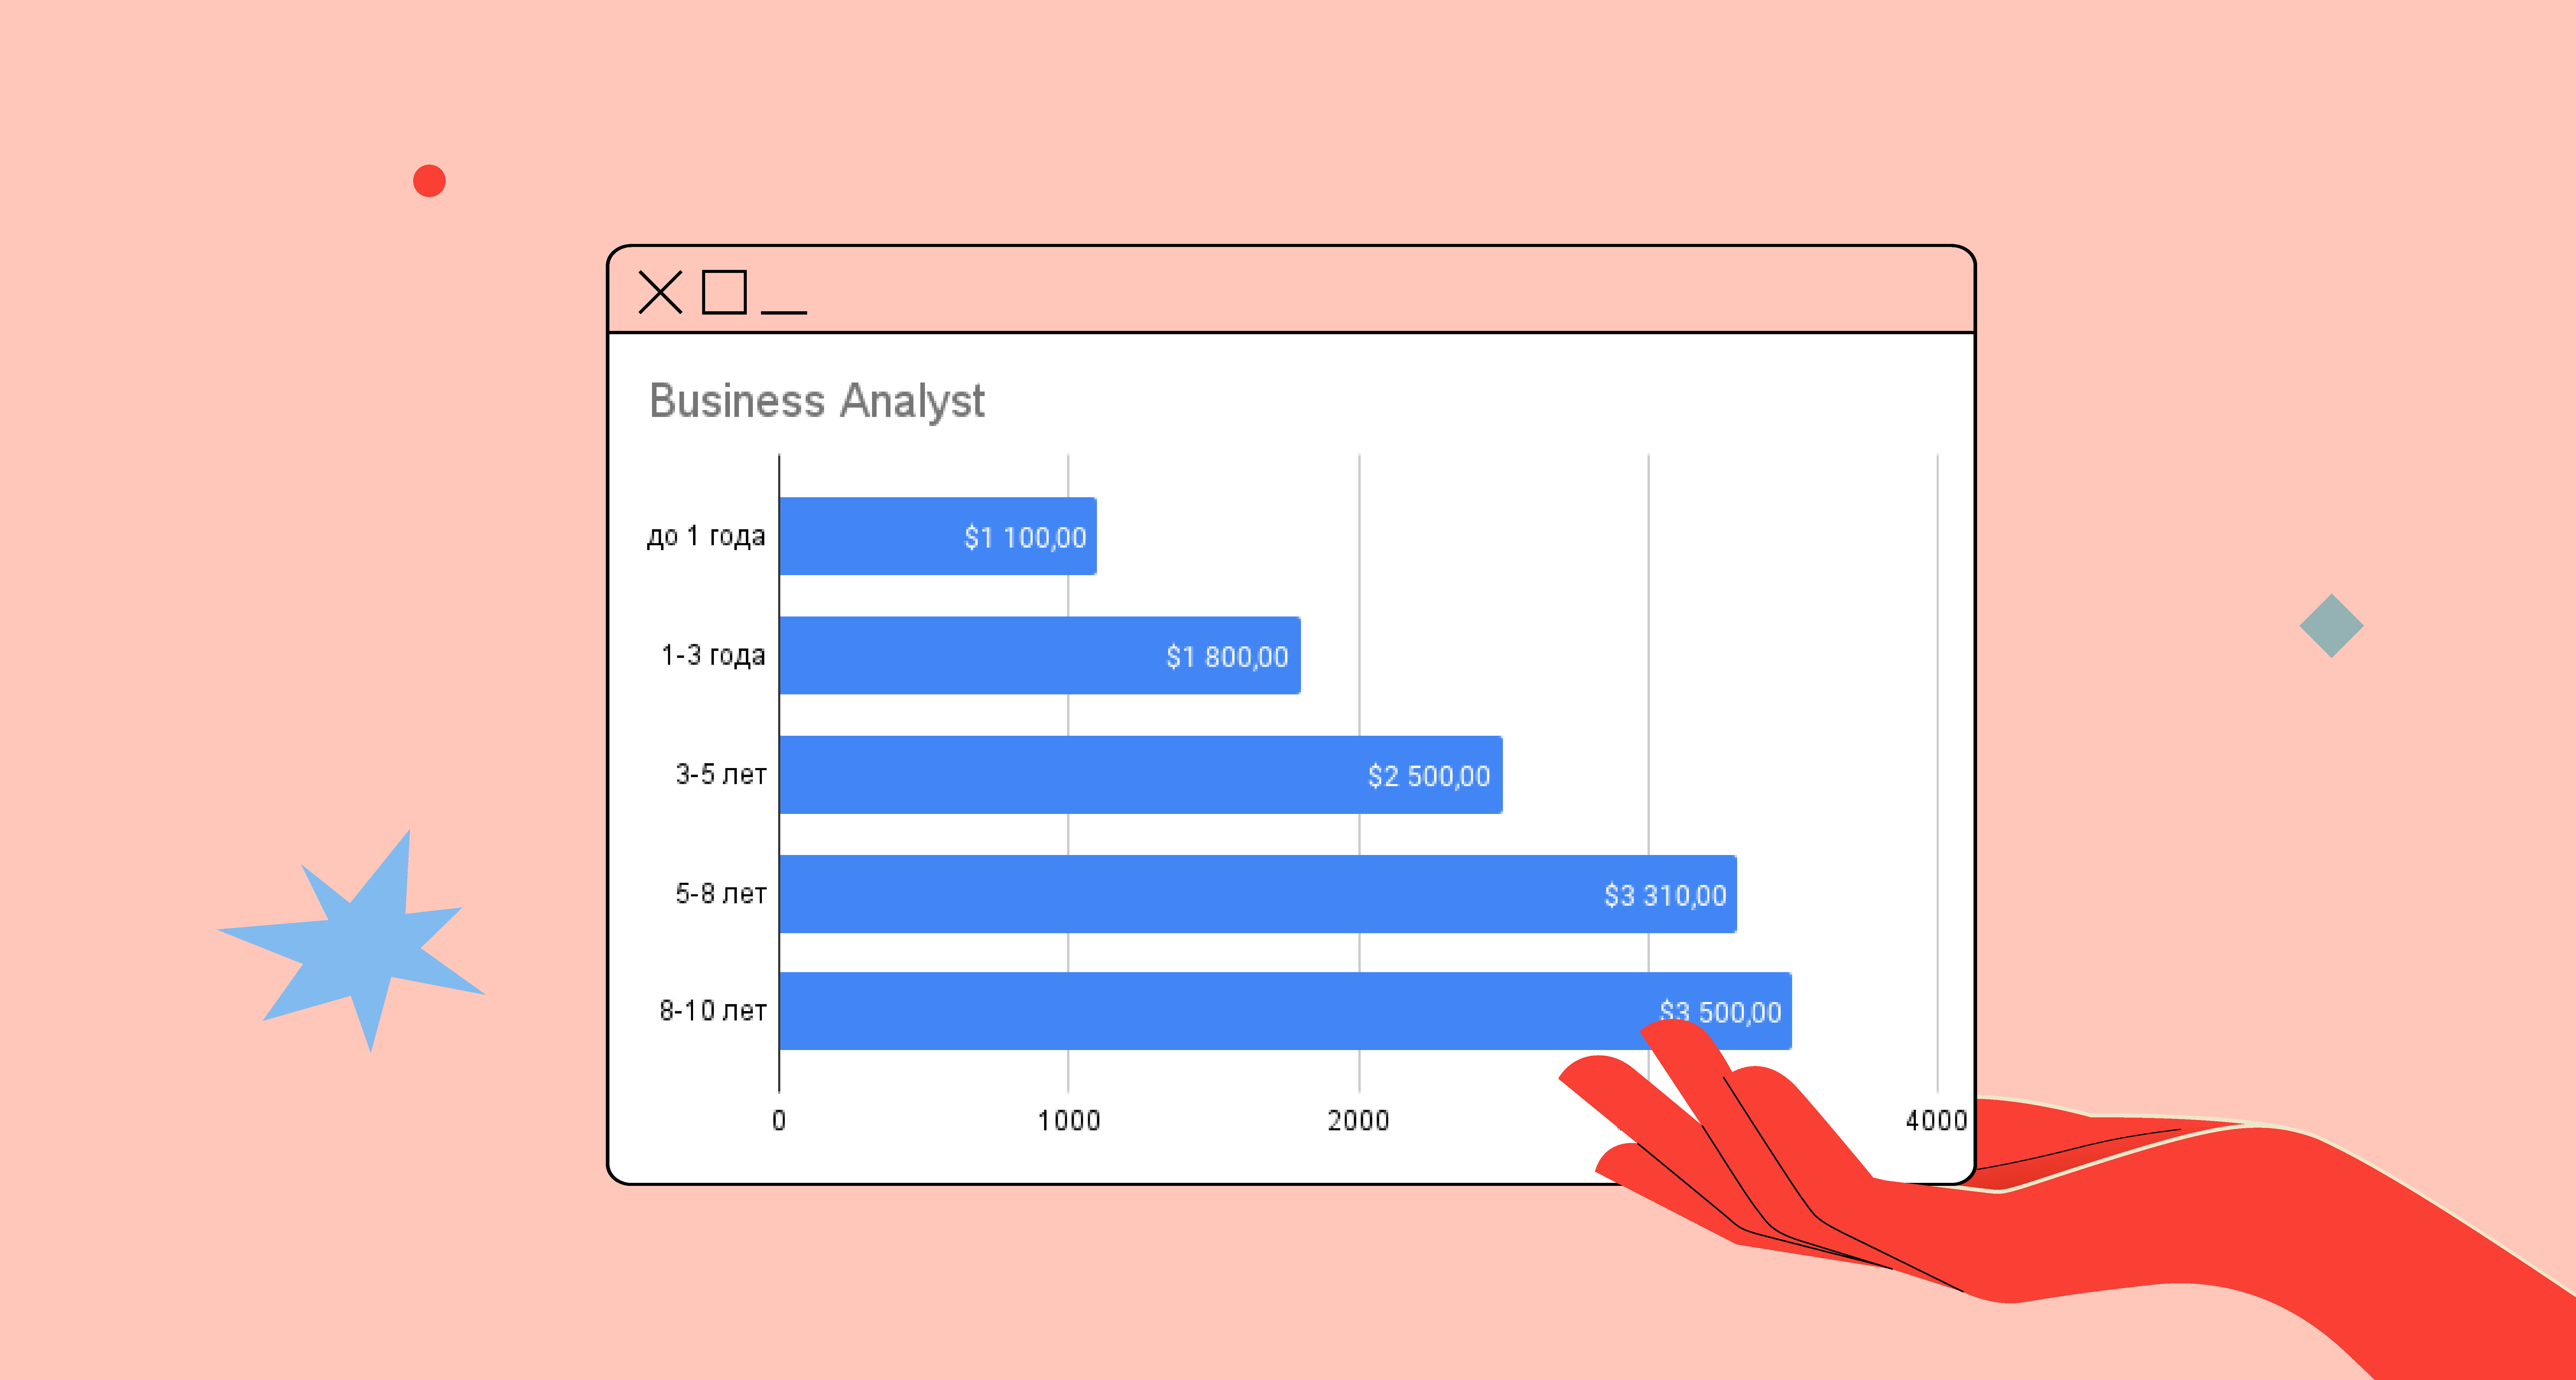 сколько платят в IT бизнес-аналитику